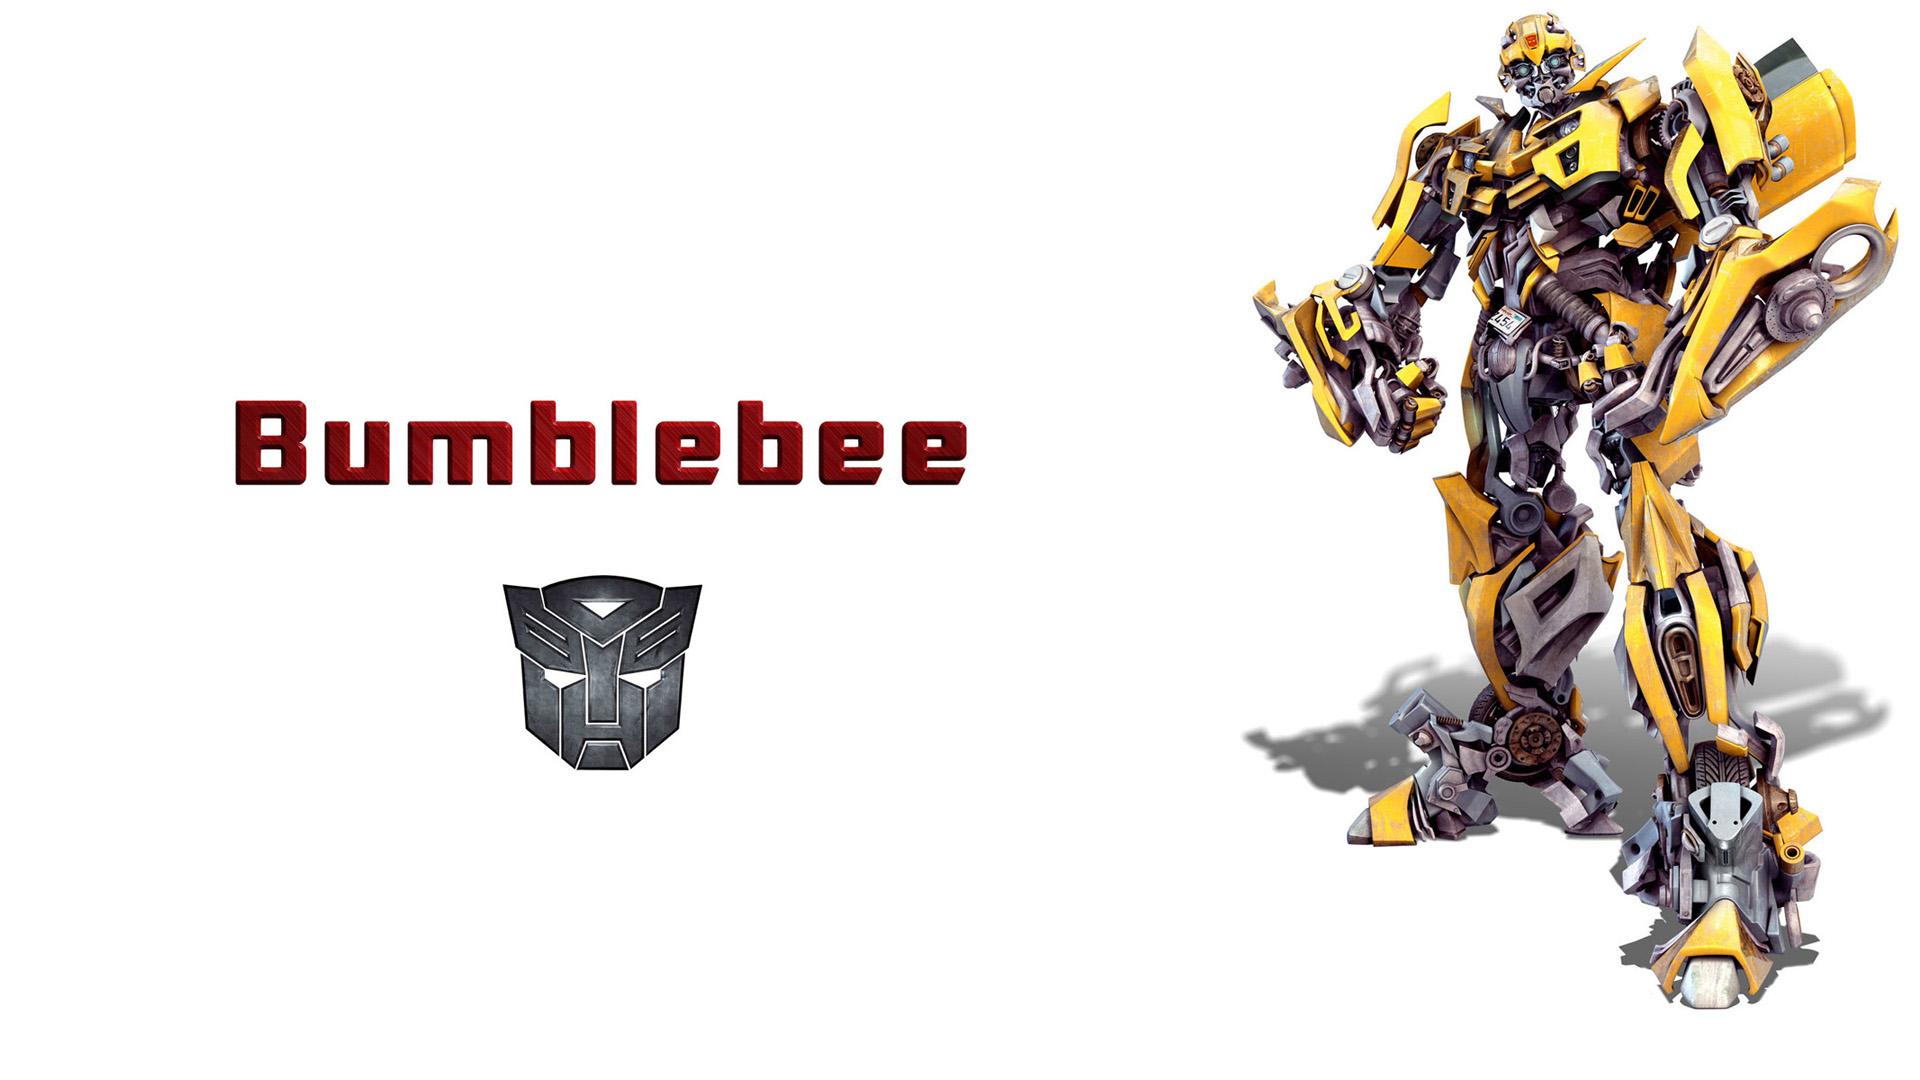 bumblebee transformer wallpaper 269630